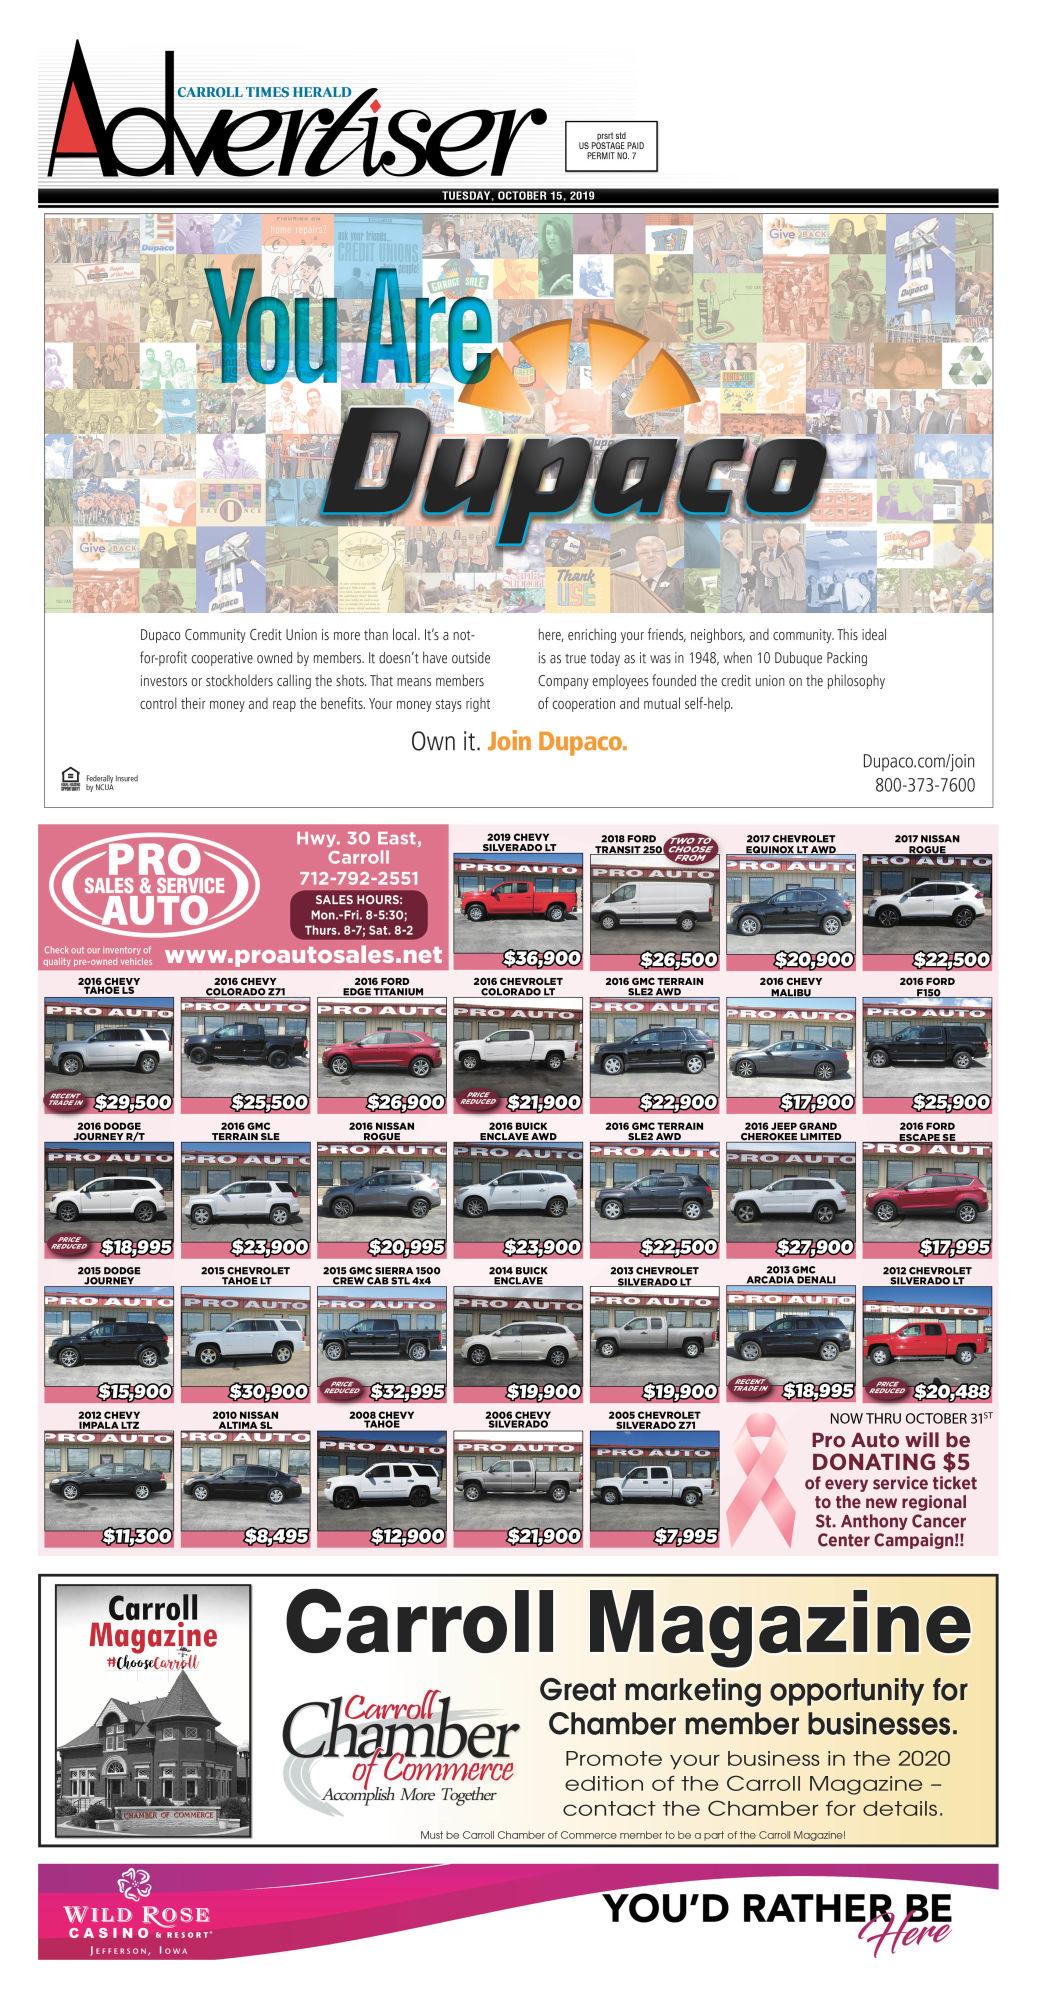 10-15 ADV Page 01.jpg